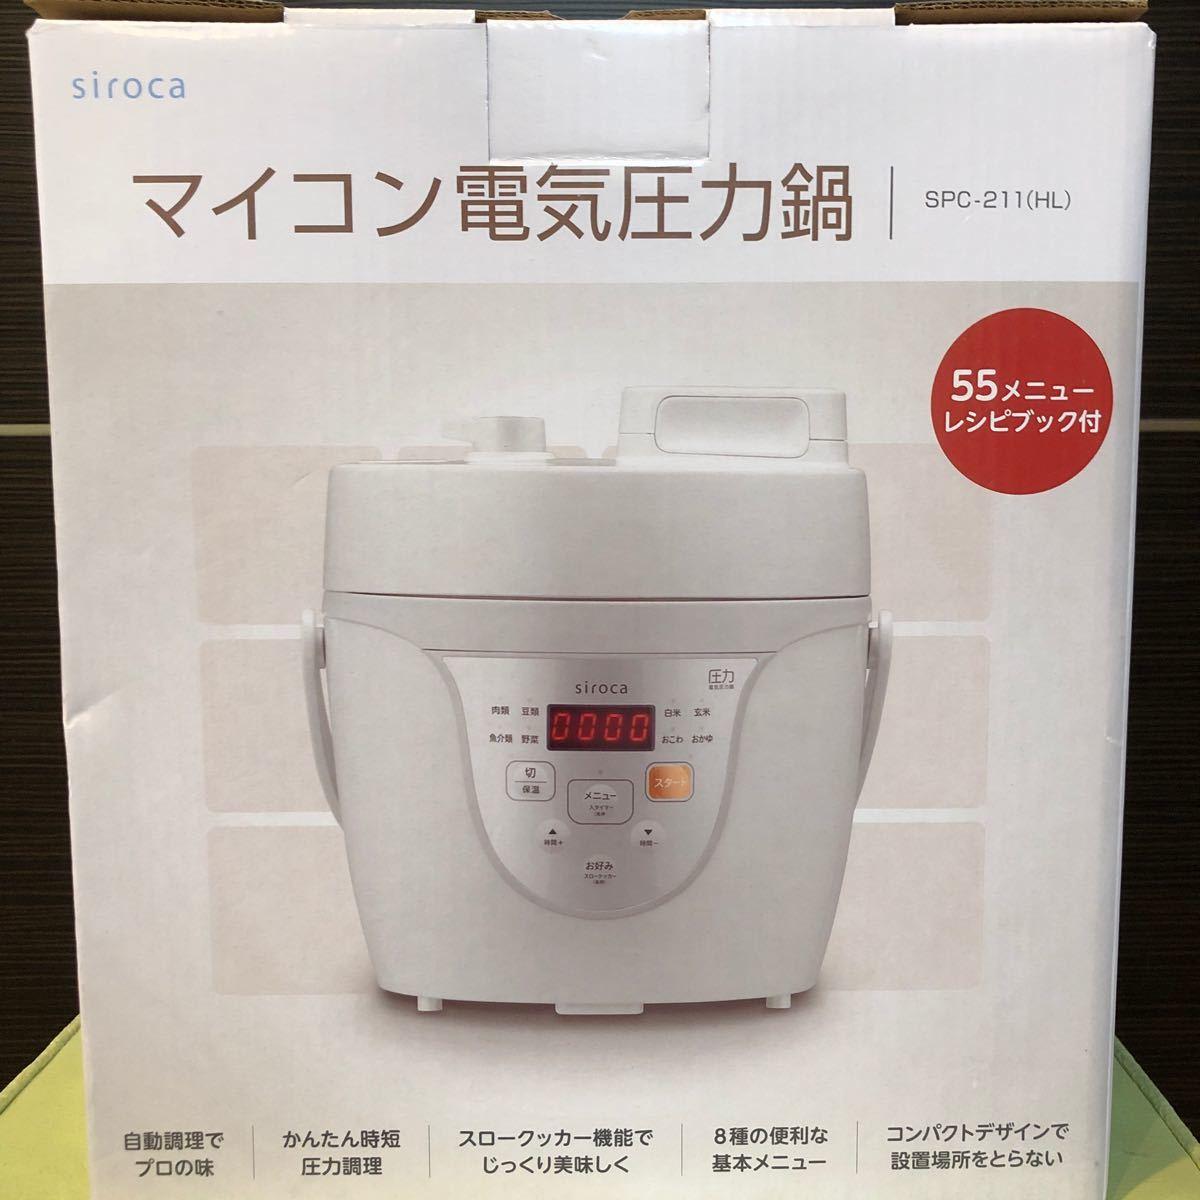 siroca 電気圧力鍋 SPC-211グレー [圧力/無水/蒸し/炊飯/スロー調理/温め直し/コンパクト]